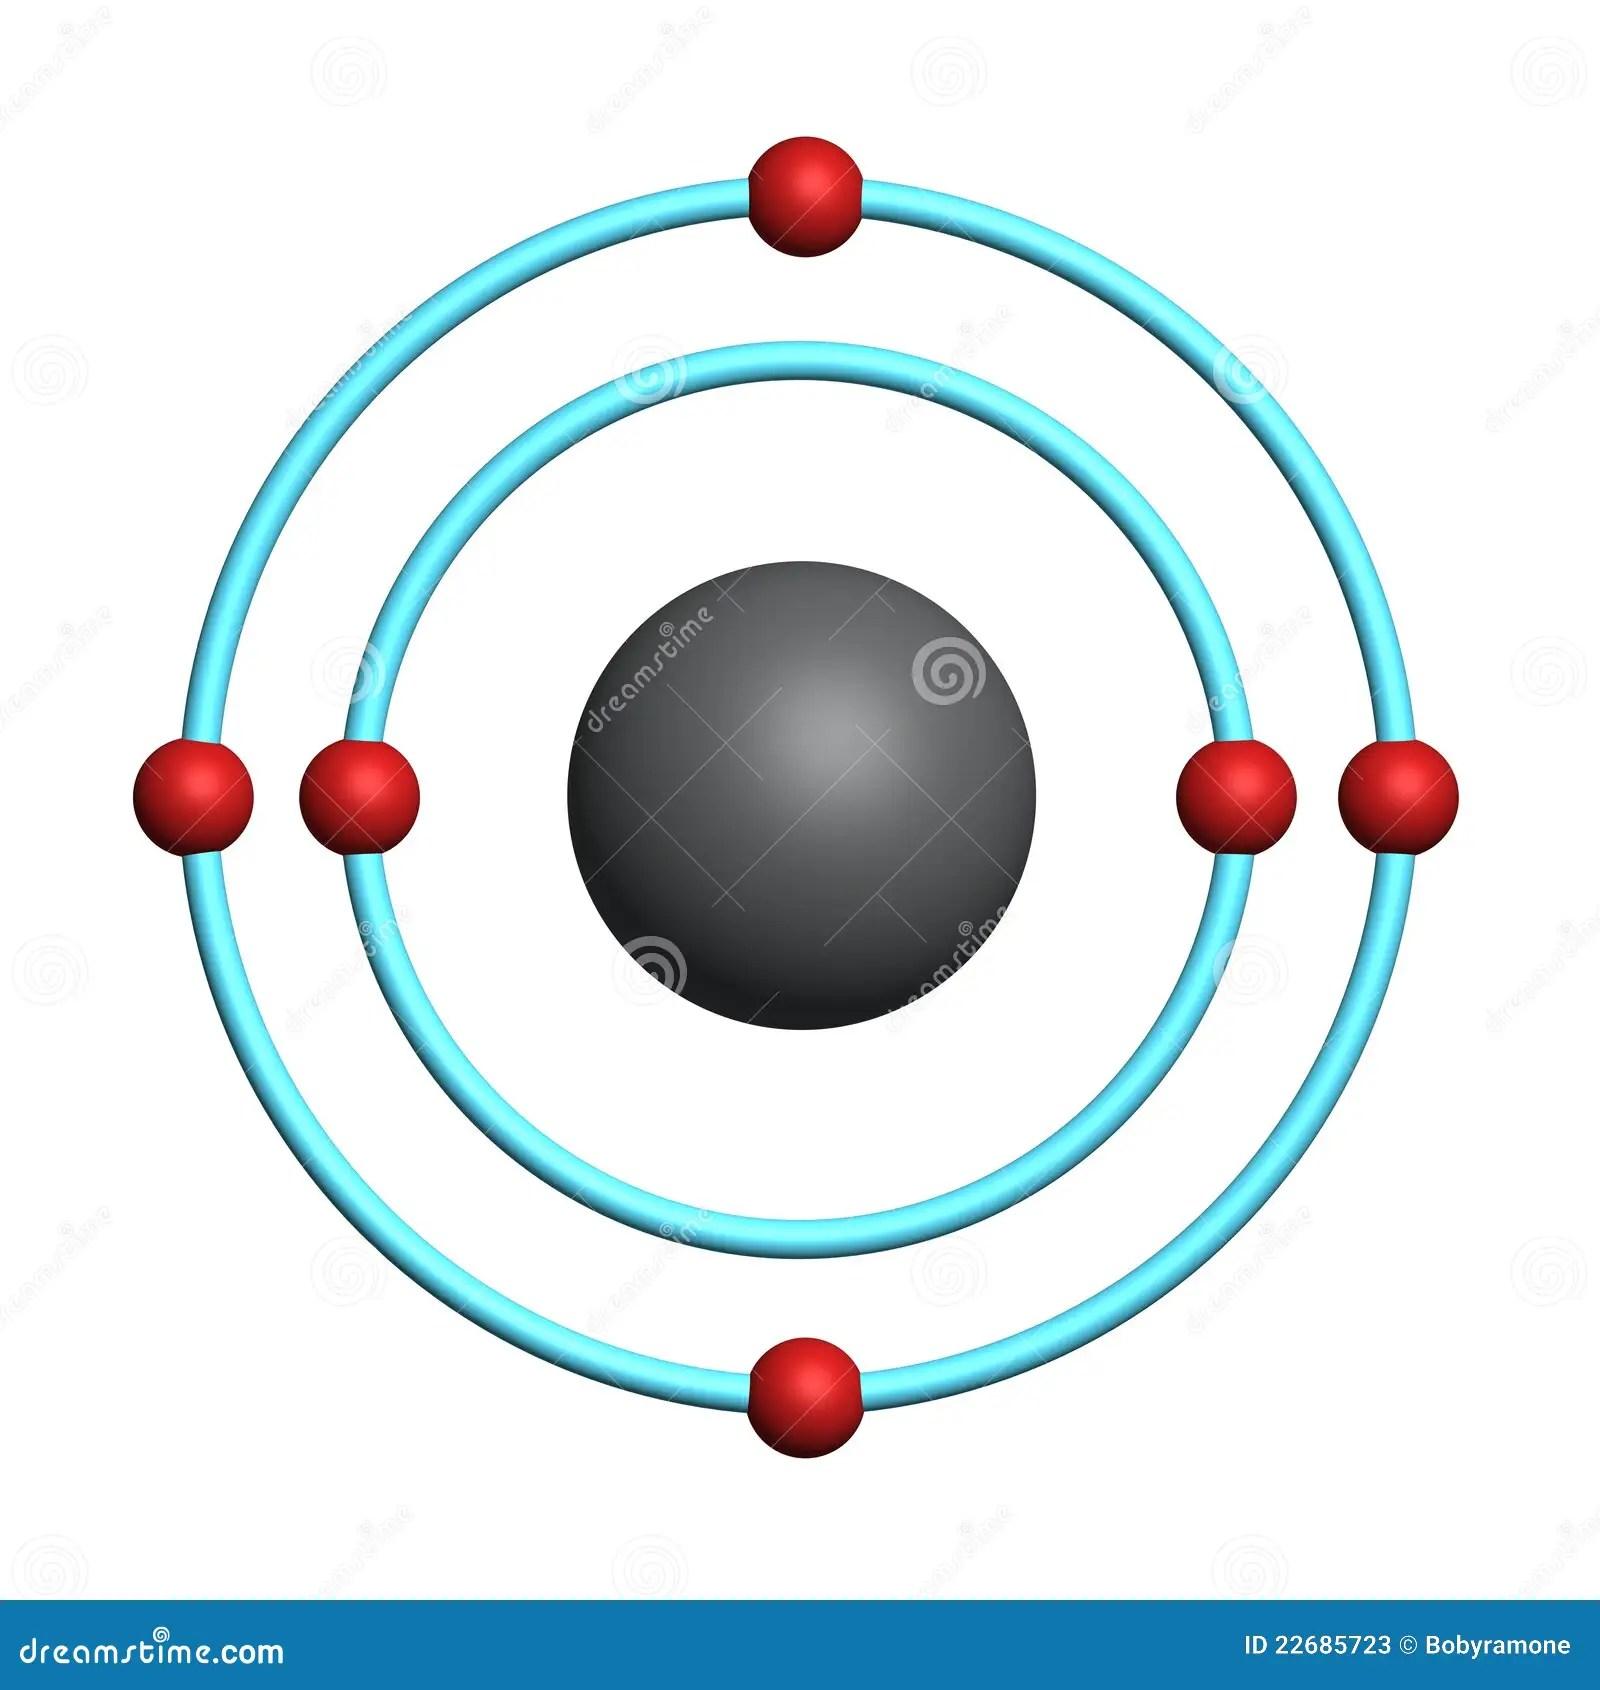 neon atom diagram uml tool open source carbon on white background stock illustration